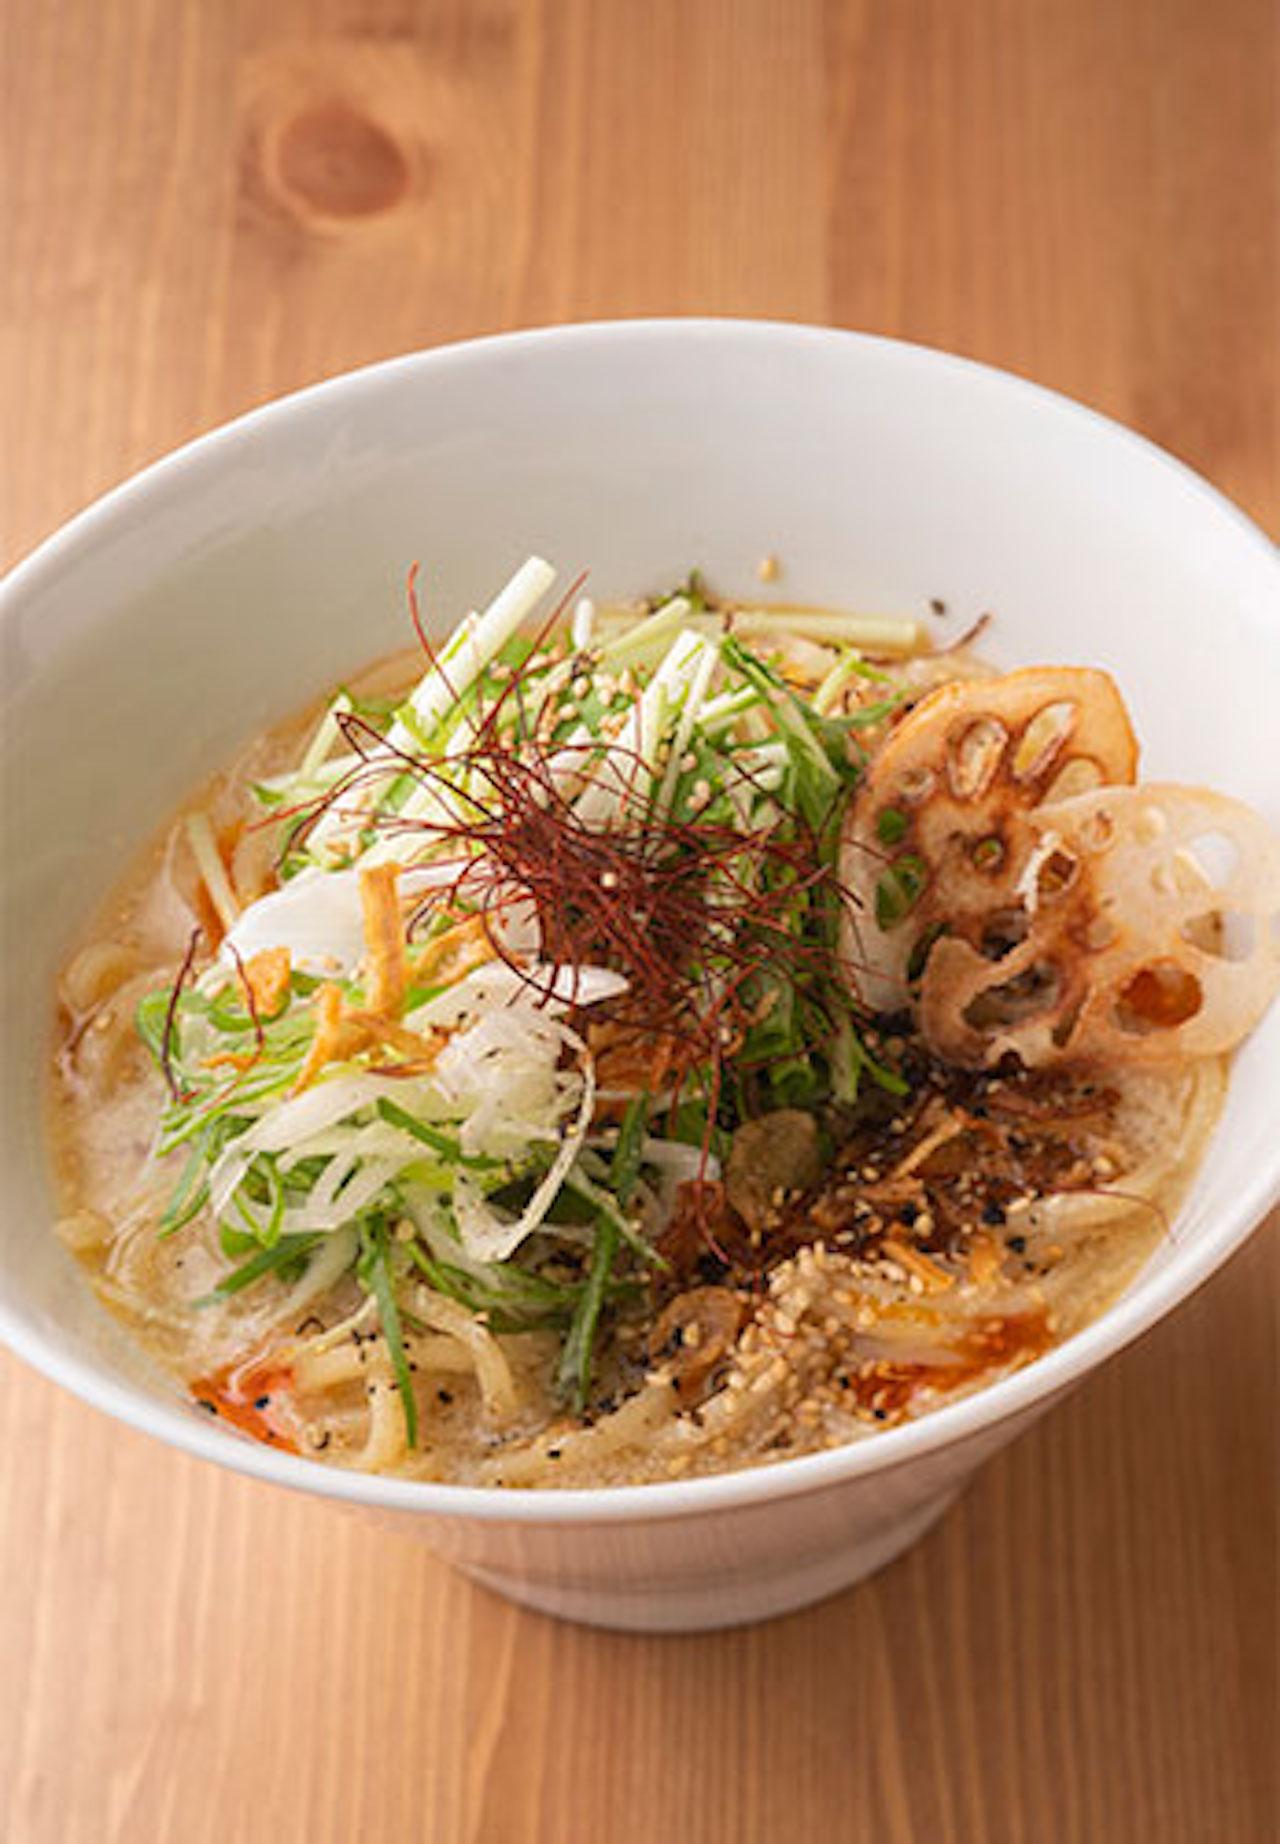 wo's Vラーメン800円。豆乳や練りゴマ、味噌を合わせたとろみのあるスープが、中太麺によく絡む。メニューはすべて売り切れ次第終了